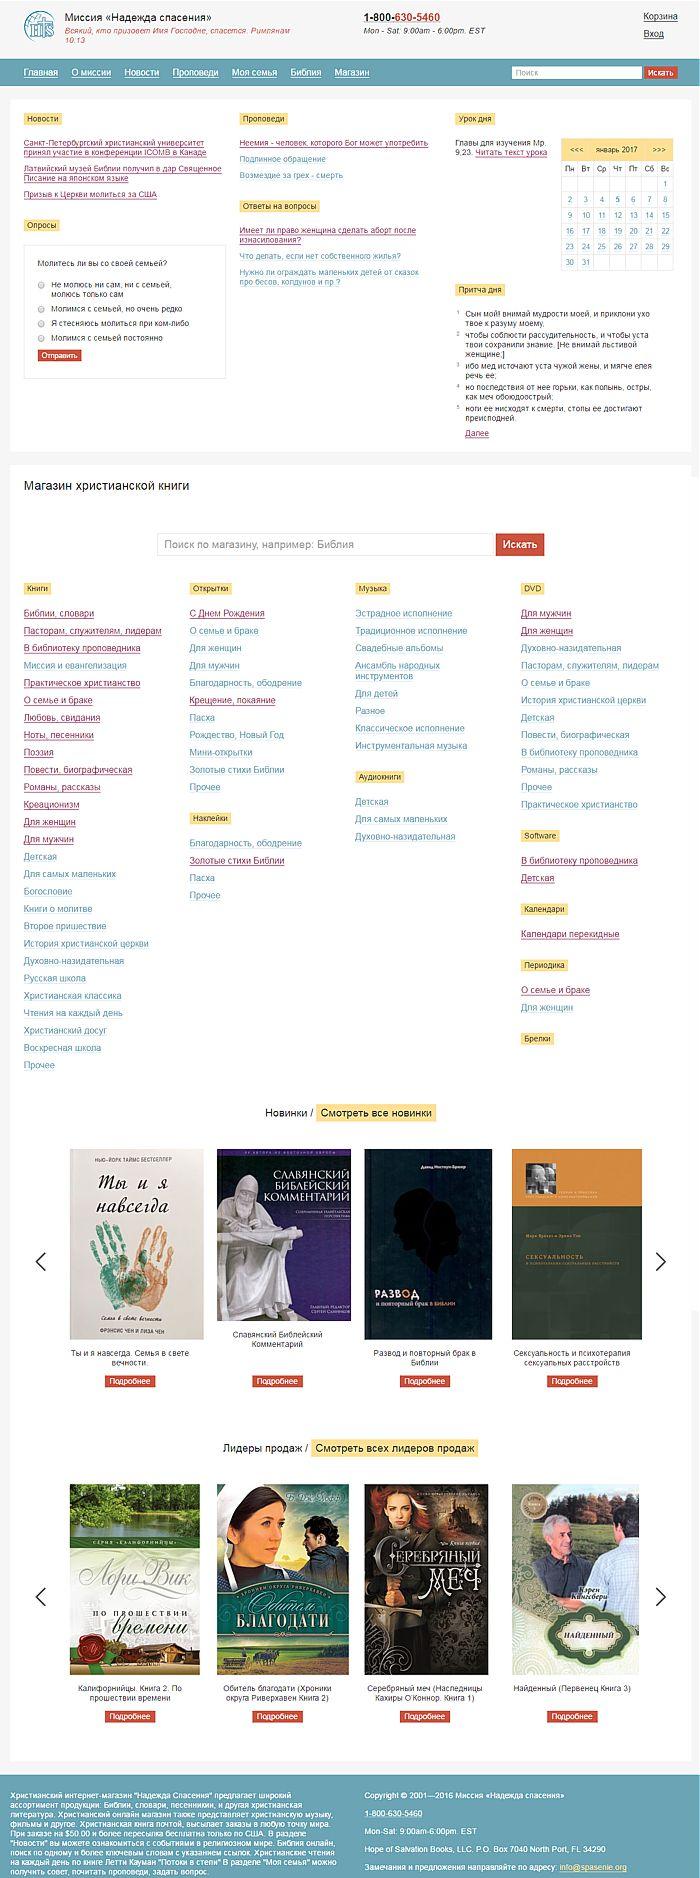 Дизайн cqnf интернет-магазина